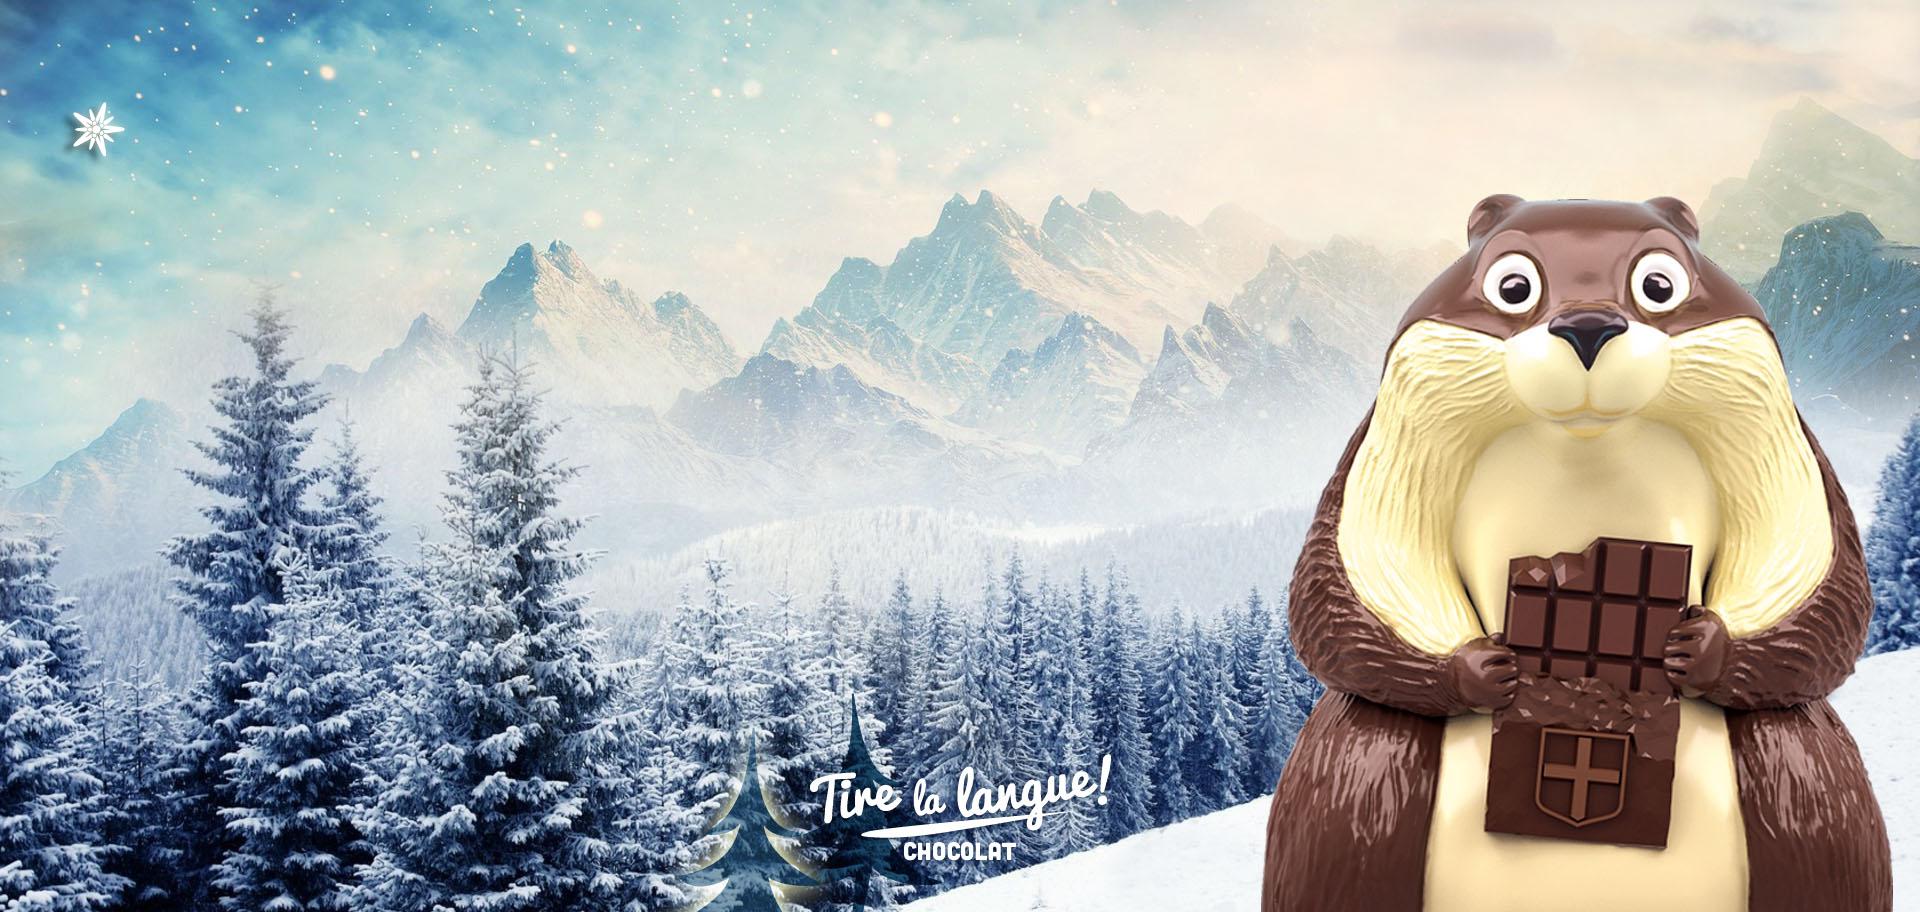 Jérôme Cottray www.tirelalangue.com #finechocolate #chocolateart #marmotte #murmeltier #marmota #groundhog #marmotta #marmot #marmotka #сурок #пасхальный #paques#пасха #pasen #ouschteren #ostern #pascua #páscoa #Πάσχα #pasqua #wielkanoc #复活节 #イースター#annecy #tirelalangue #chocolatier #チョコレート #шоколадник #schokoladenfabrikant #chocolatierin #schokoladenhersteller #chocolatero #chocolateiro #cioccolatiere #cioccolatiera #chocolademaker #czekolady #шоколада #шоколадник #bio #choco #alps #frenchalps #frenchpastry #patisserie #clusaz #megeve #zermatt #chamonix #courchevel #serrechevalier #aravis #grand-bornand #chocolate #mold #mould #yum #yummy #delicious #chocolatemolds #pornfood #instafood #organic #luxury #luxechocolate #organicchocolate #bioproducts #produitbio #mountain@tirelalangue @chocolat @annecy